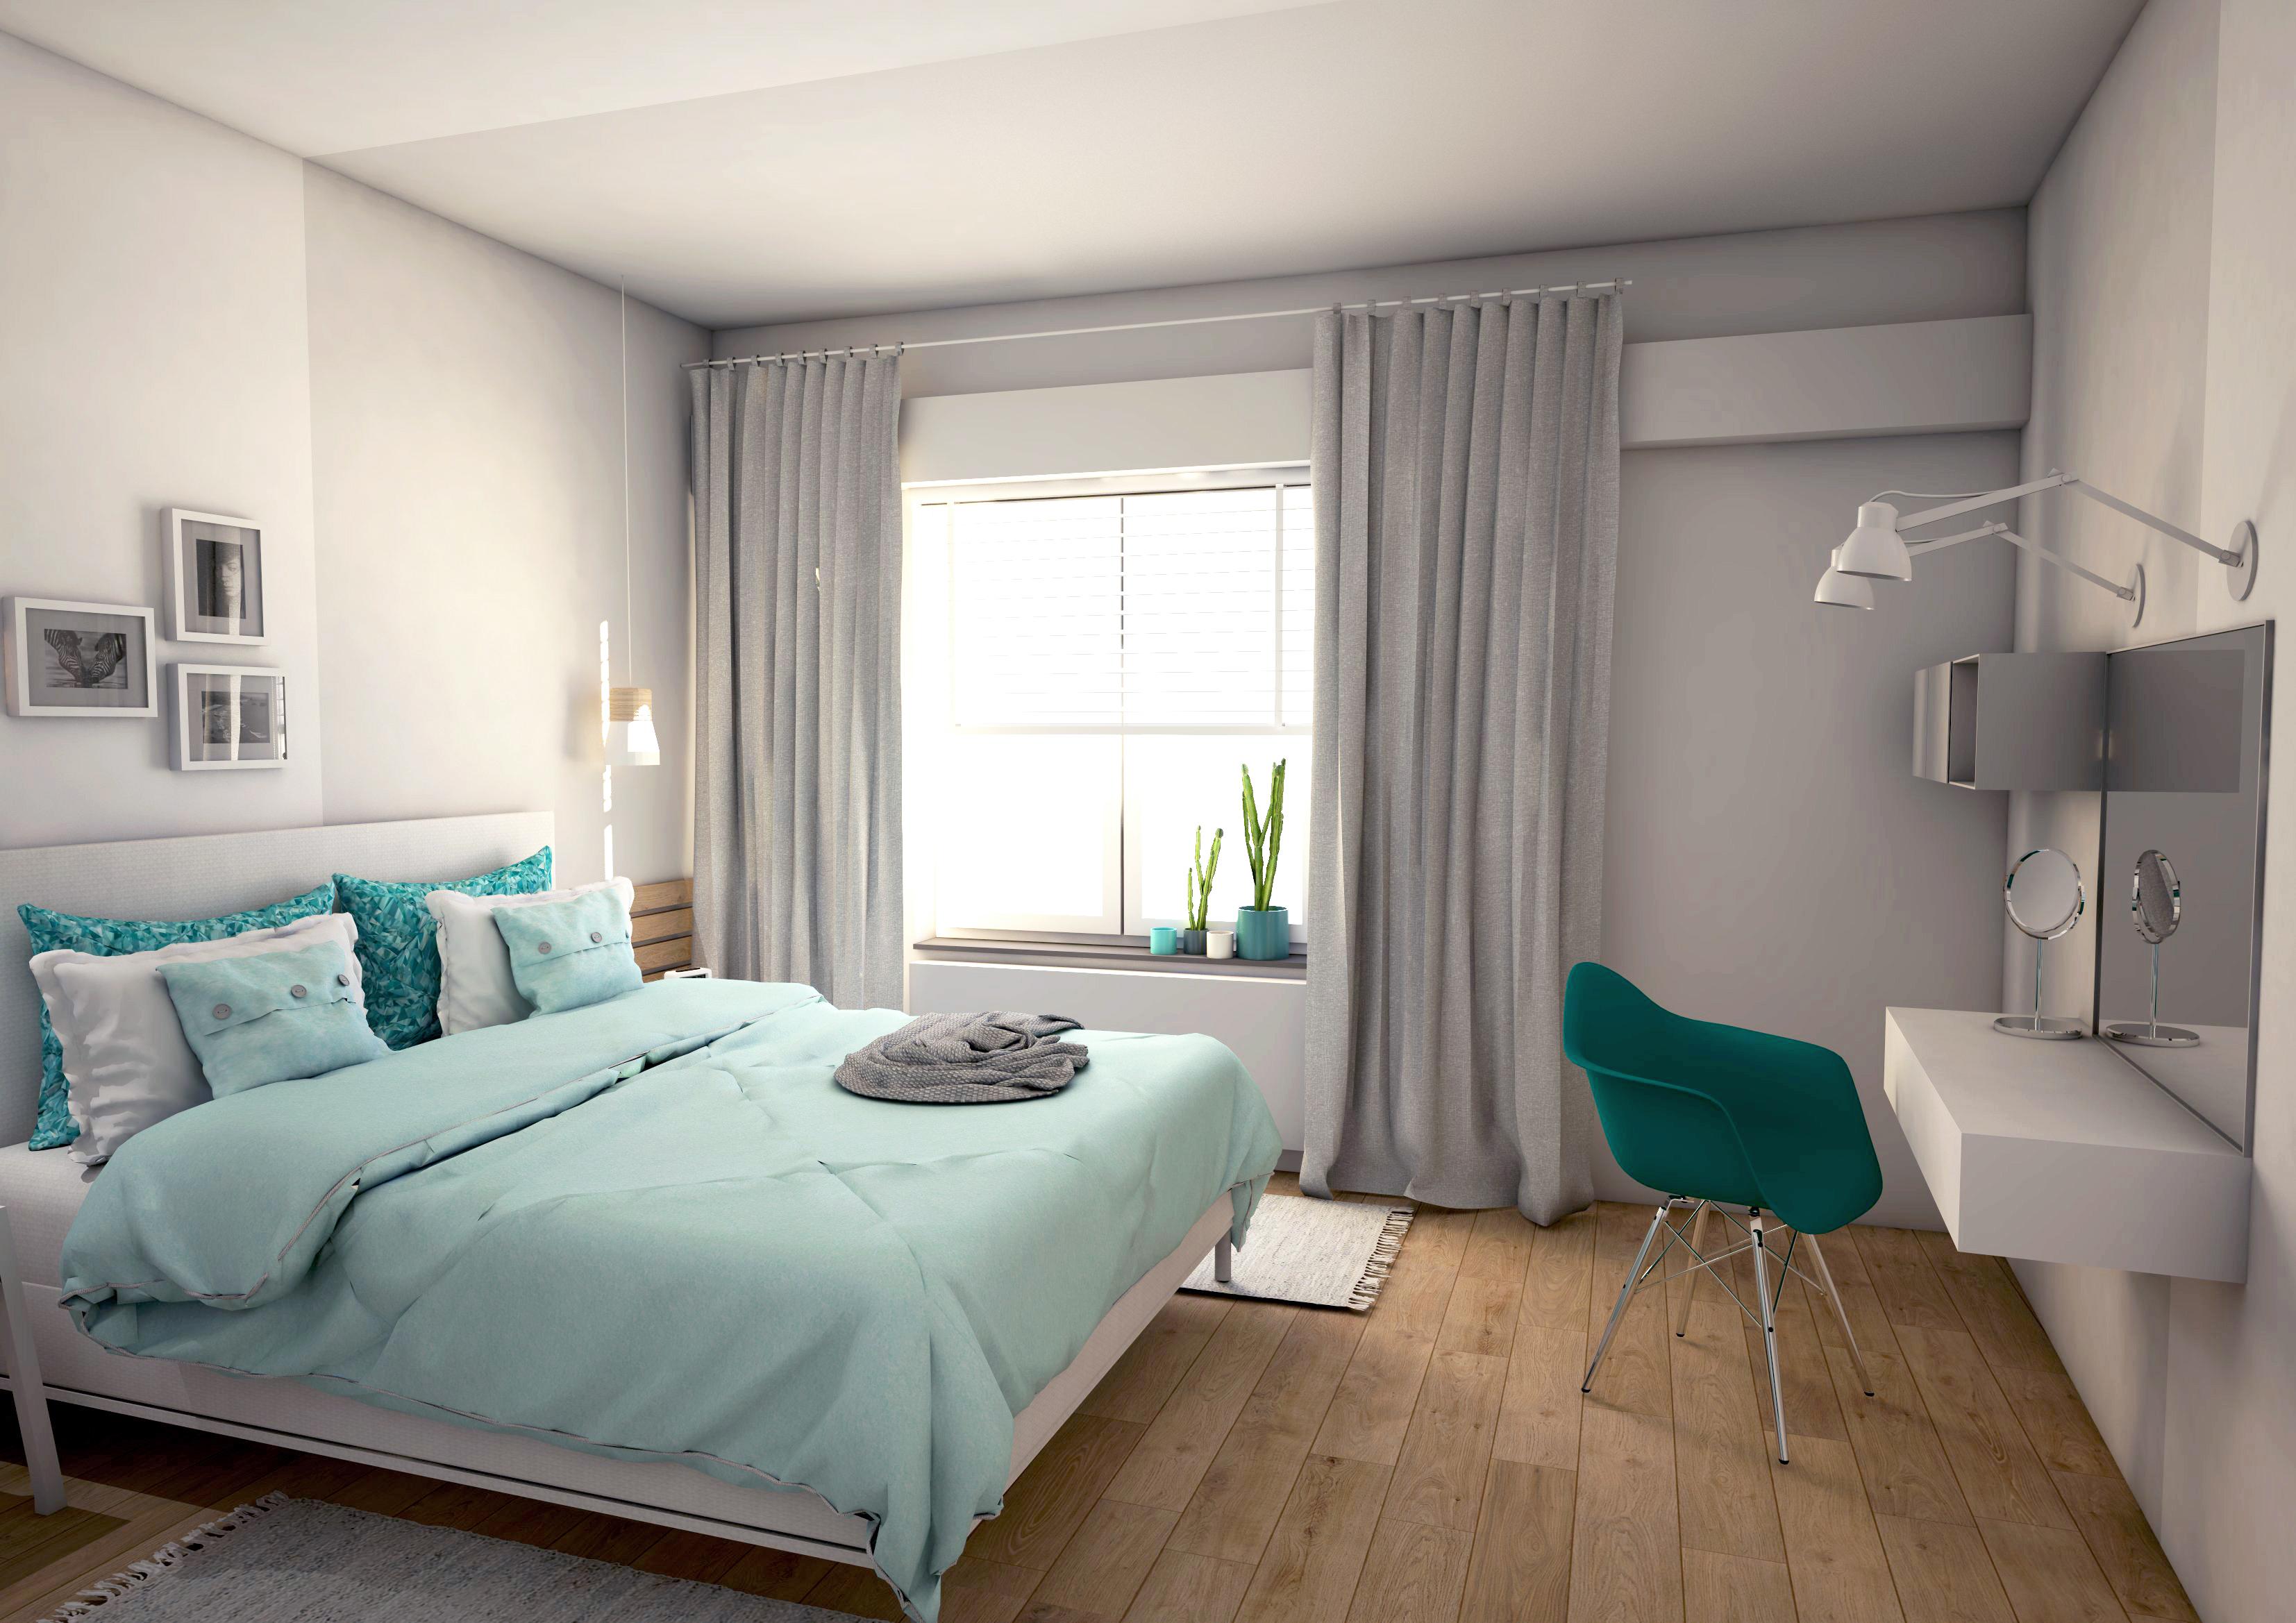 slaapkamer turquoise - Studio em